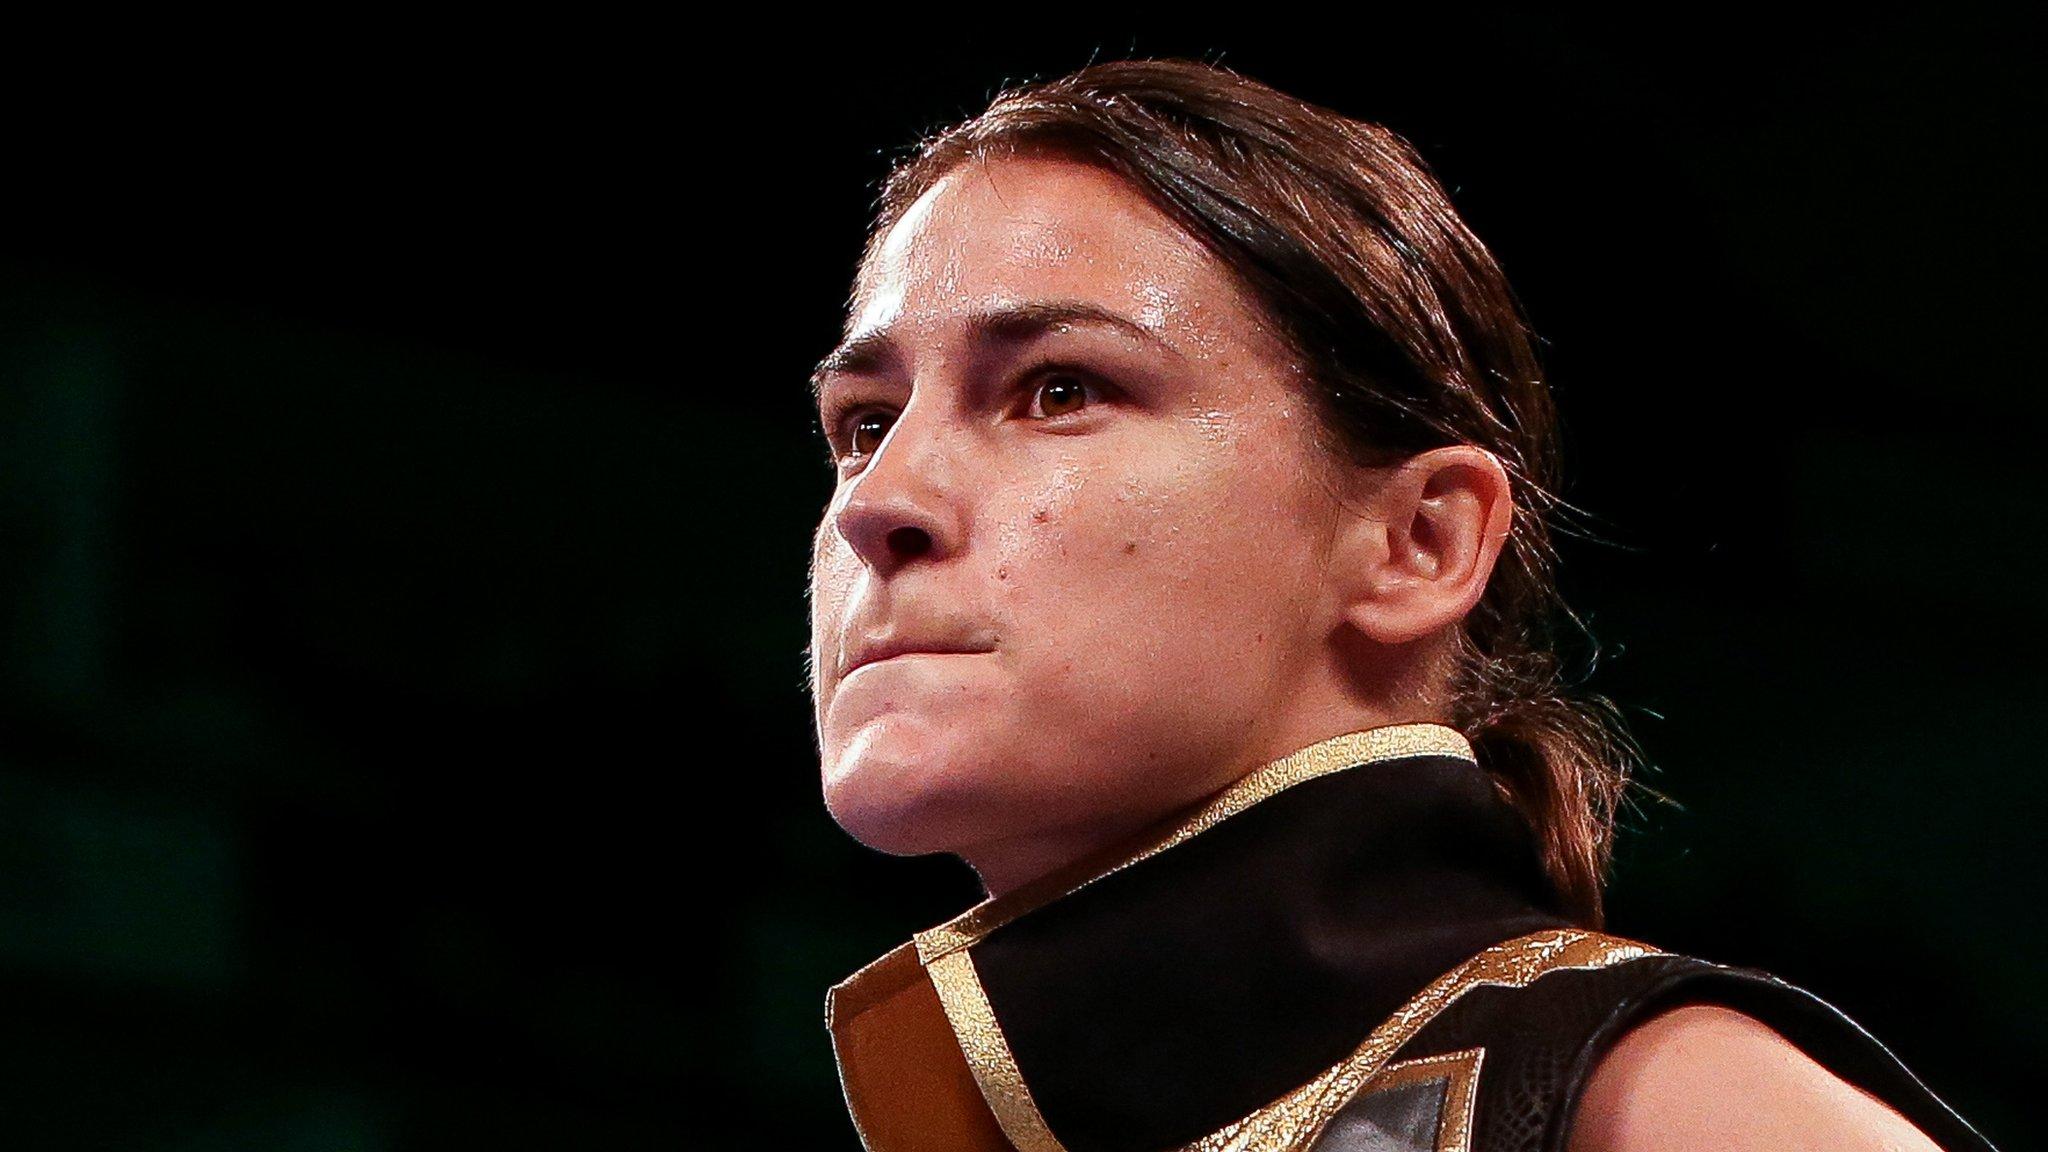 Katie Taylor: Dominant Irish woman beats Serrano to retain world titles